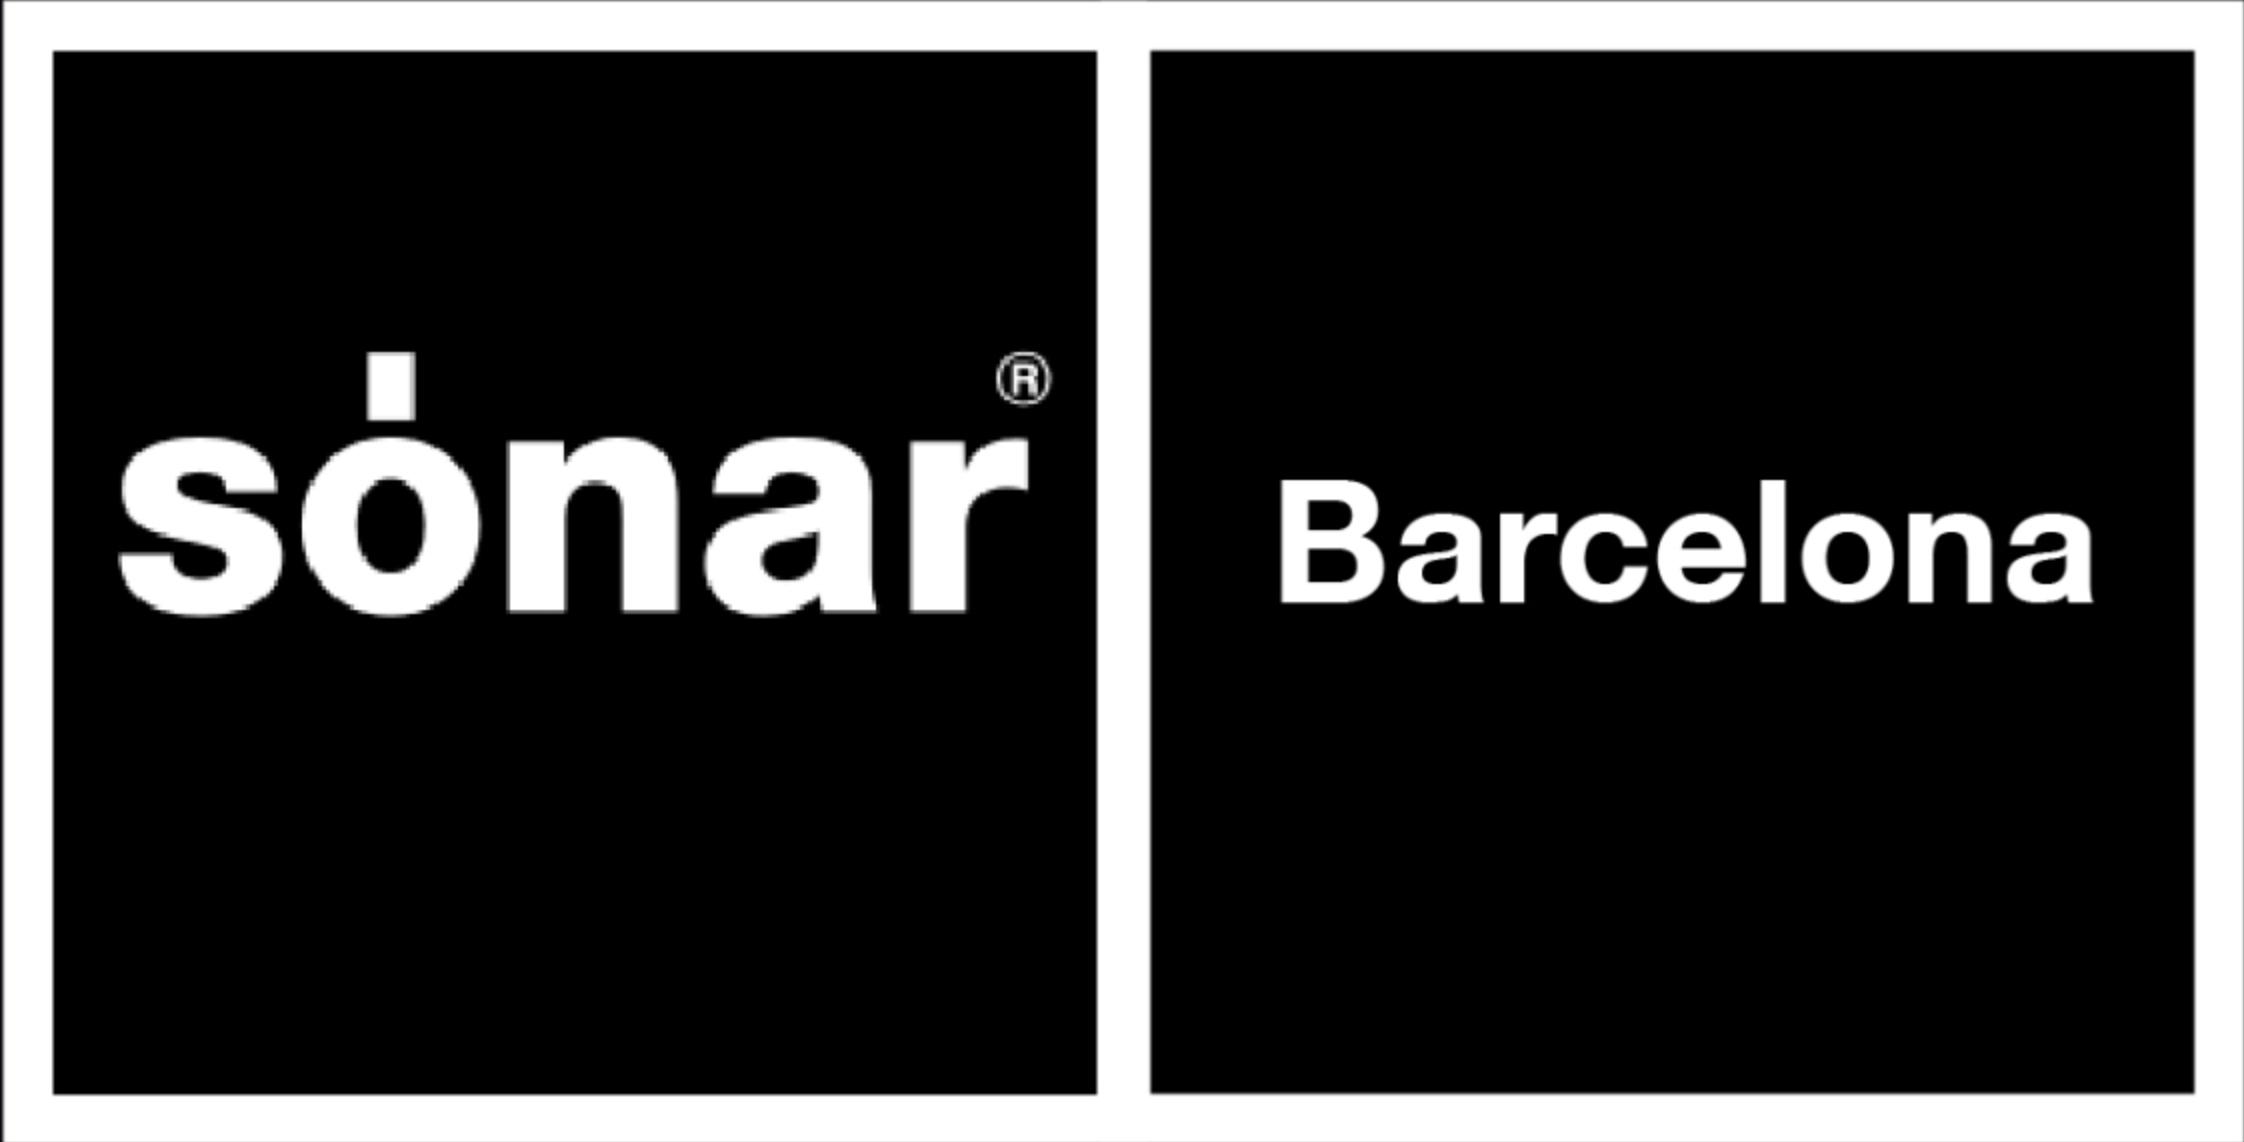 Sonar Barcelona